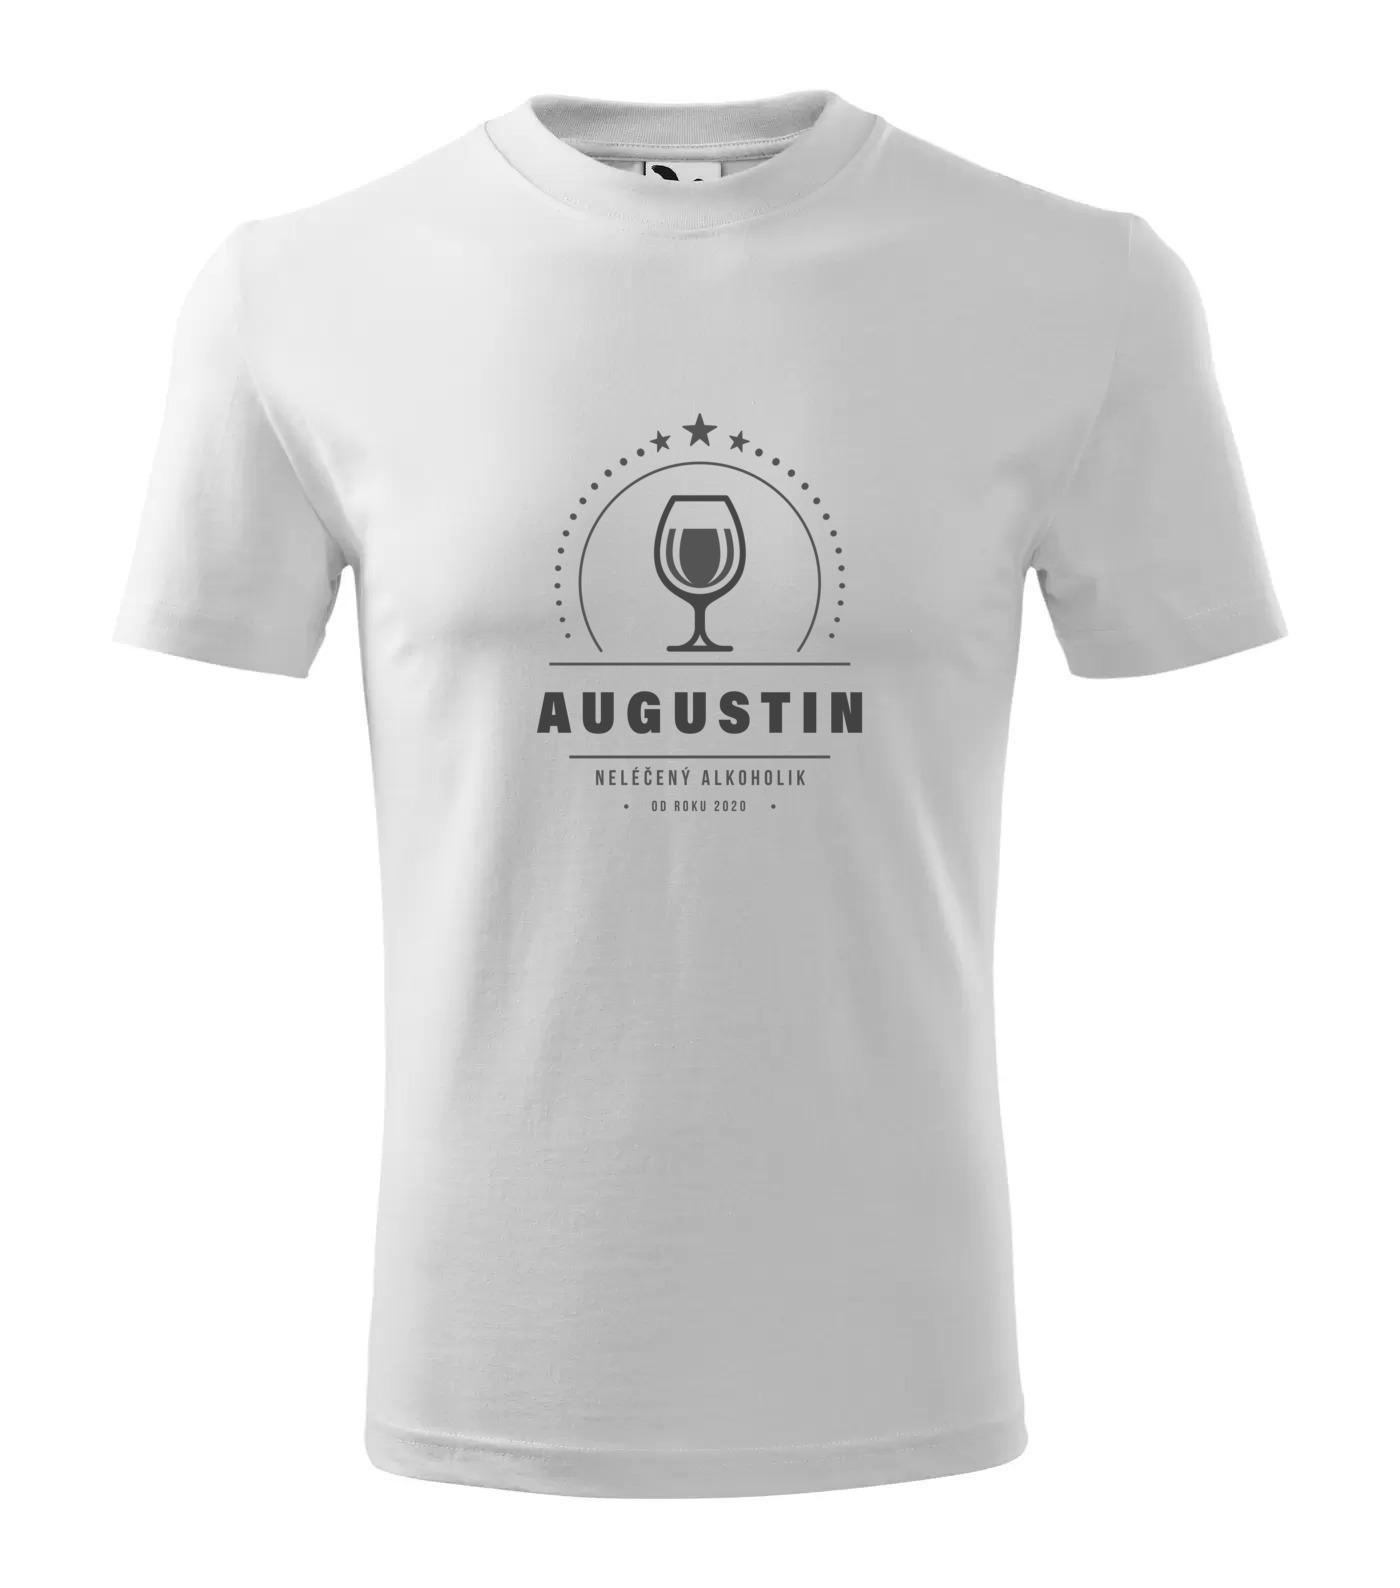 Tričko Alkoholik Augustin